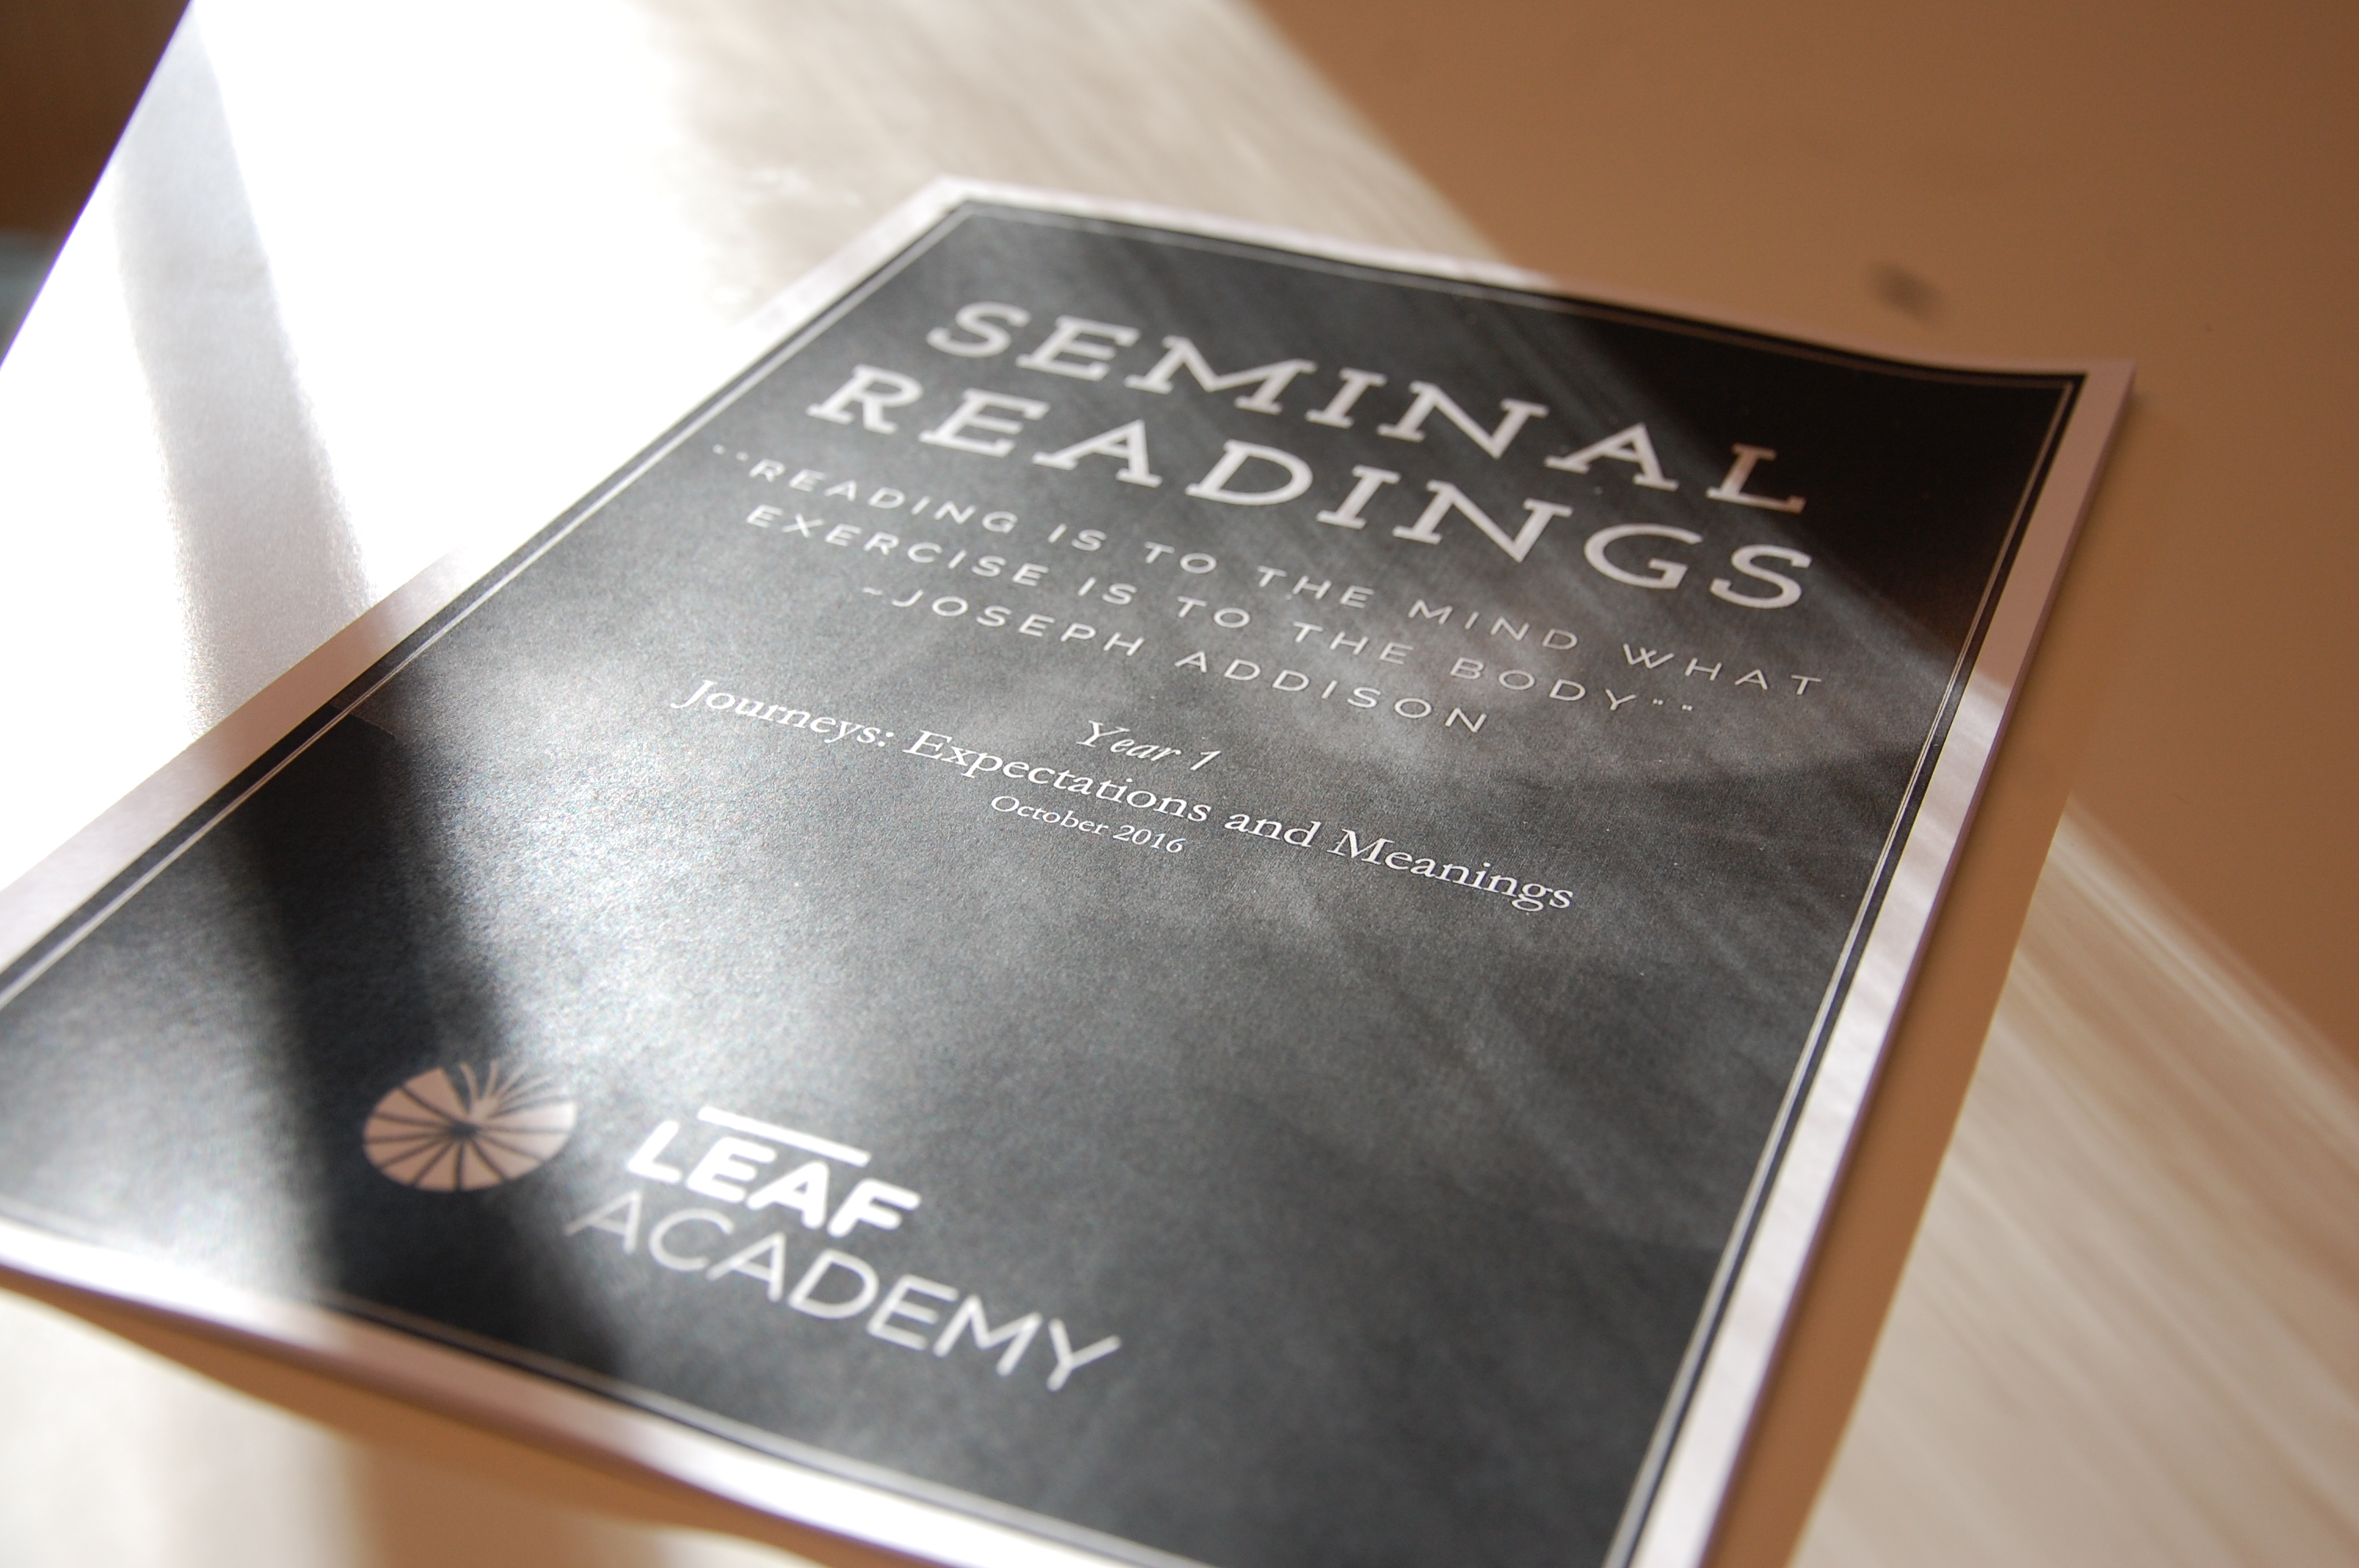 Seminal reading at LEAF Academy